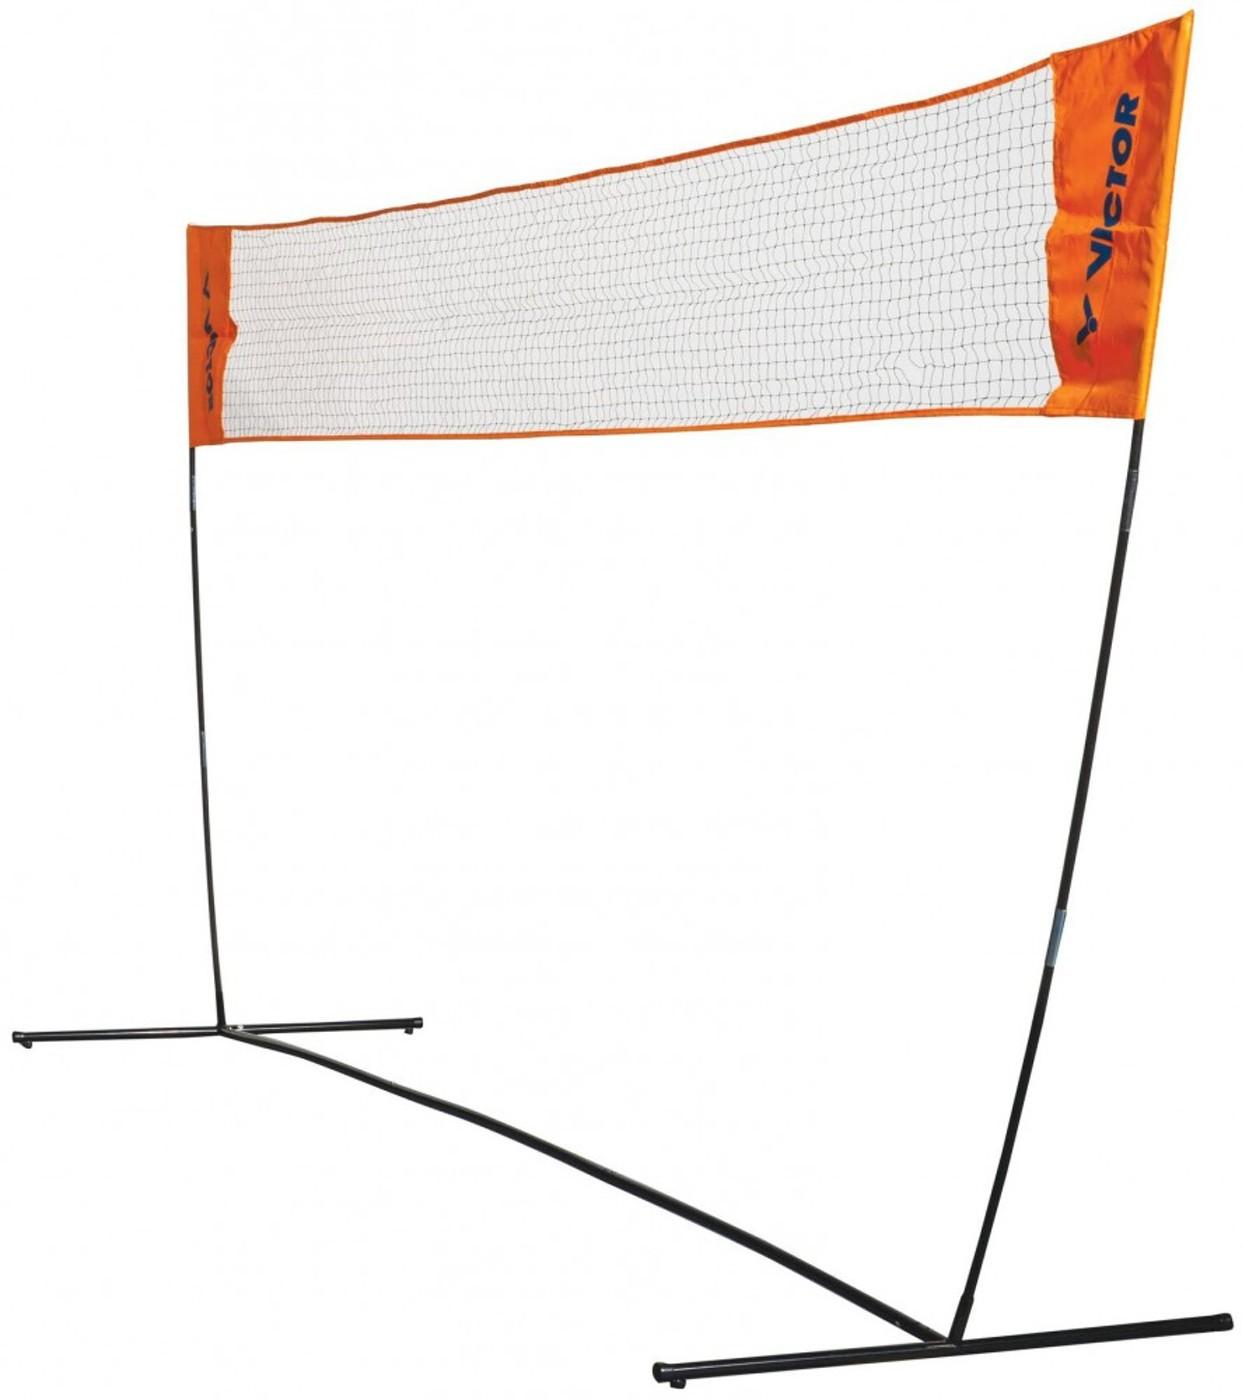 VICTOR Mini-Badminton Netz Easy